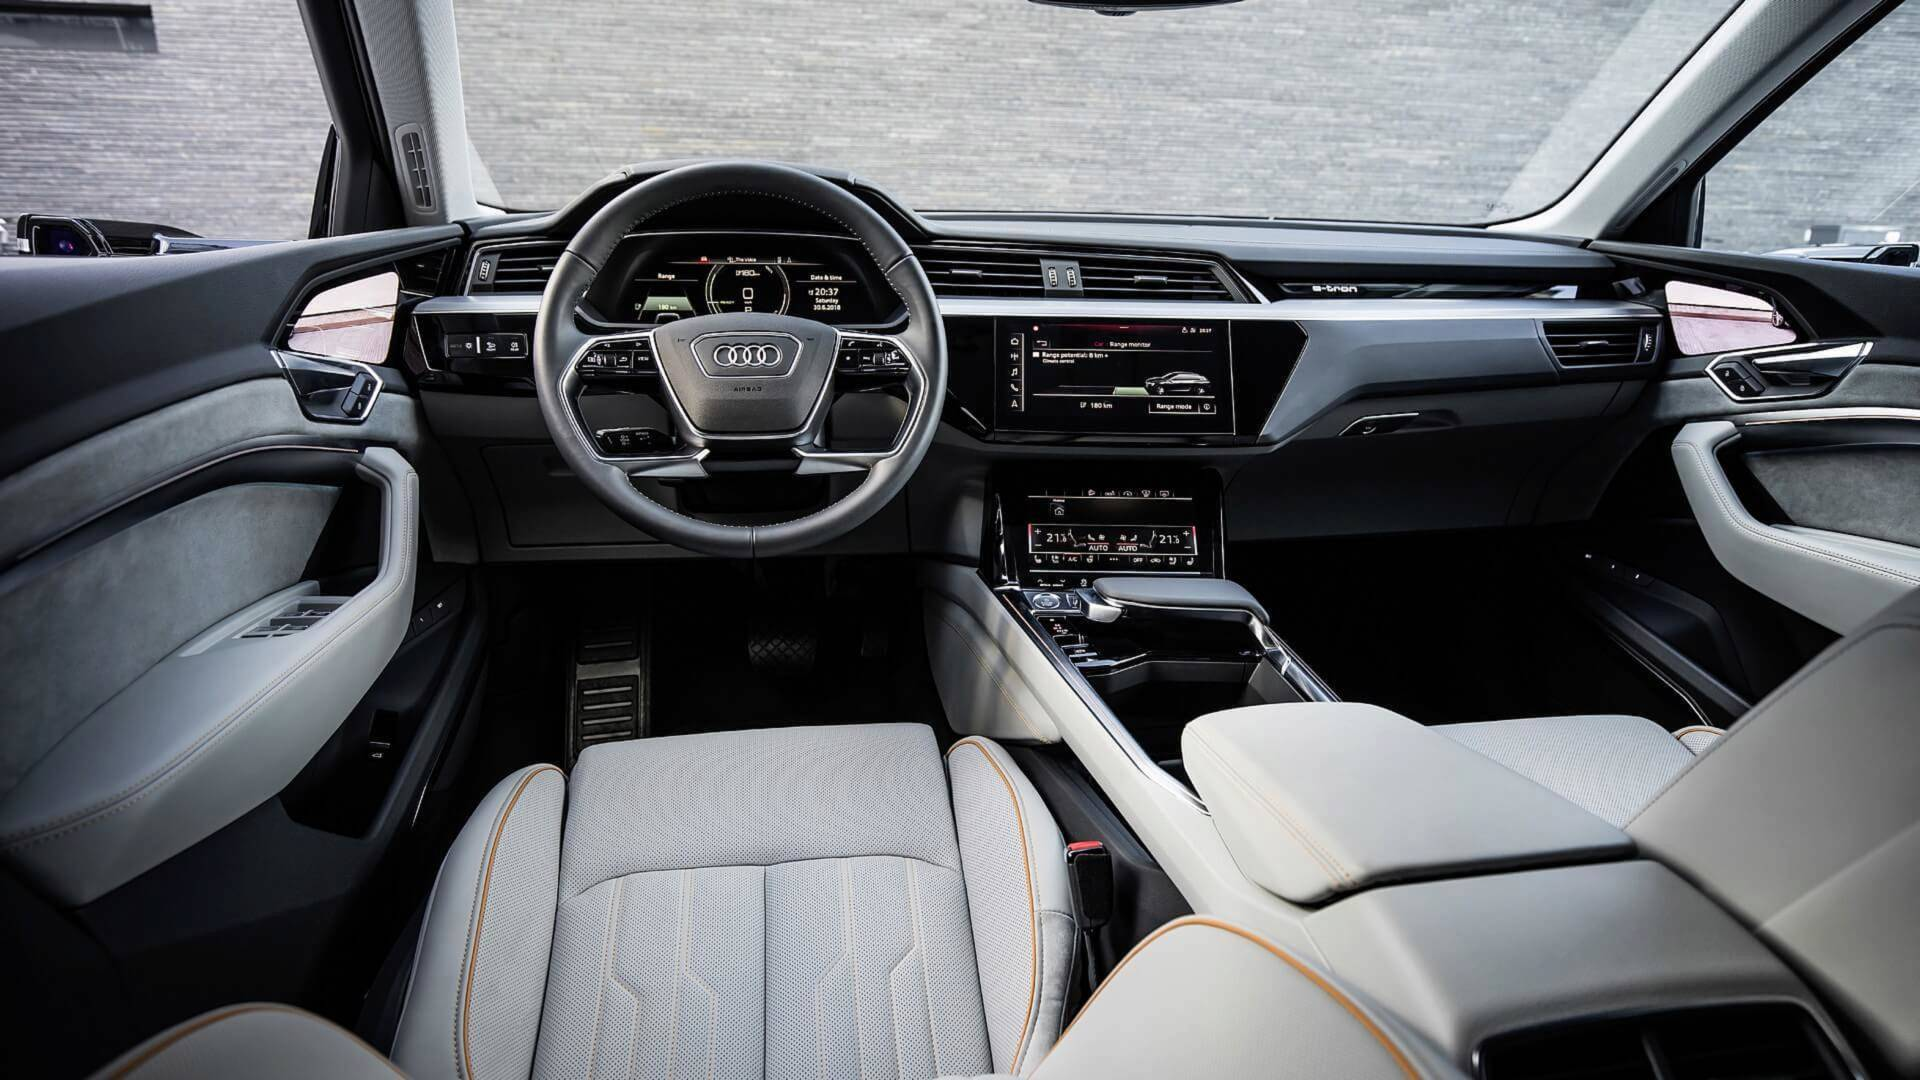 Audi E Tron Reveals High Tech Interior With Five Screens